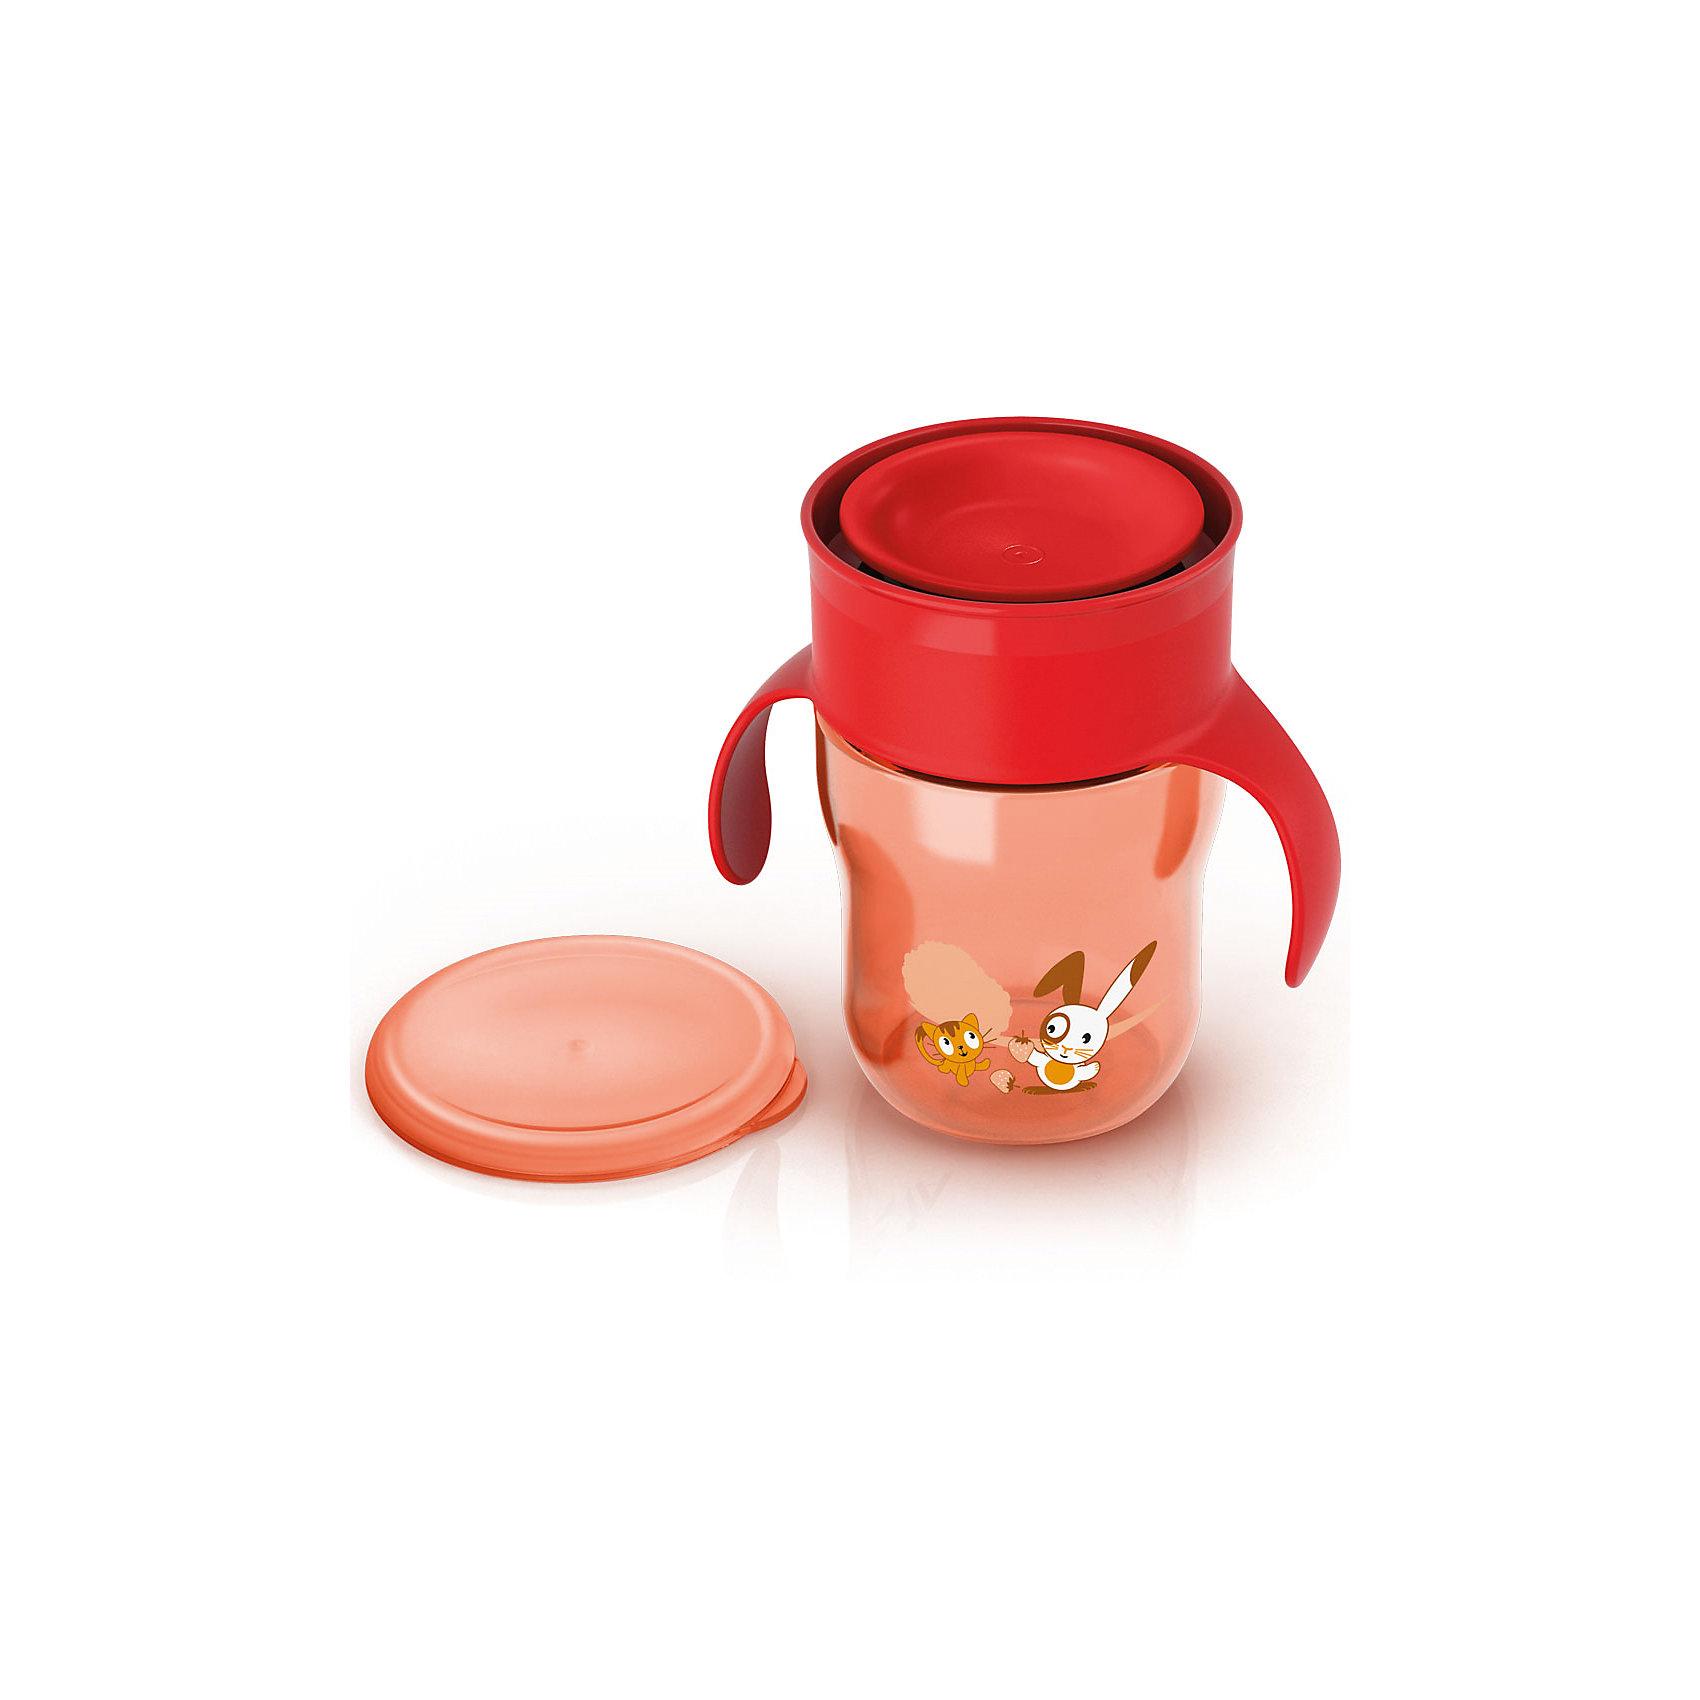 PHILIPS AVENT Поильник-чашка , 260мл, AVENT, красный